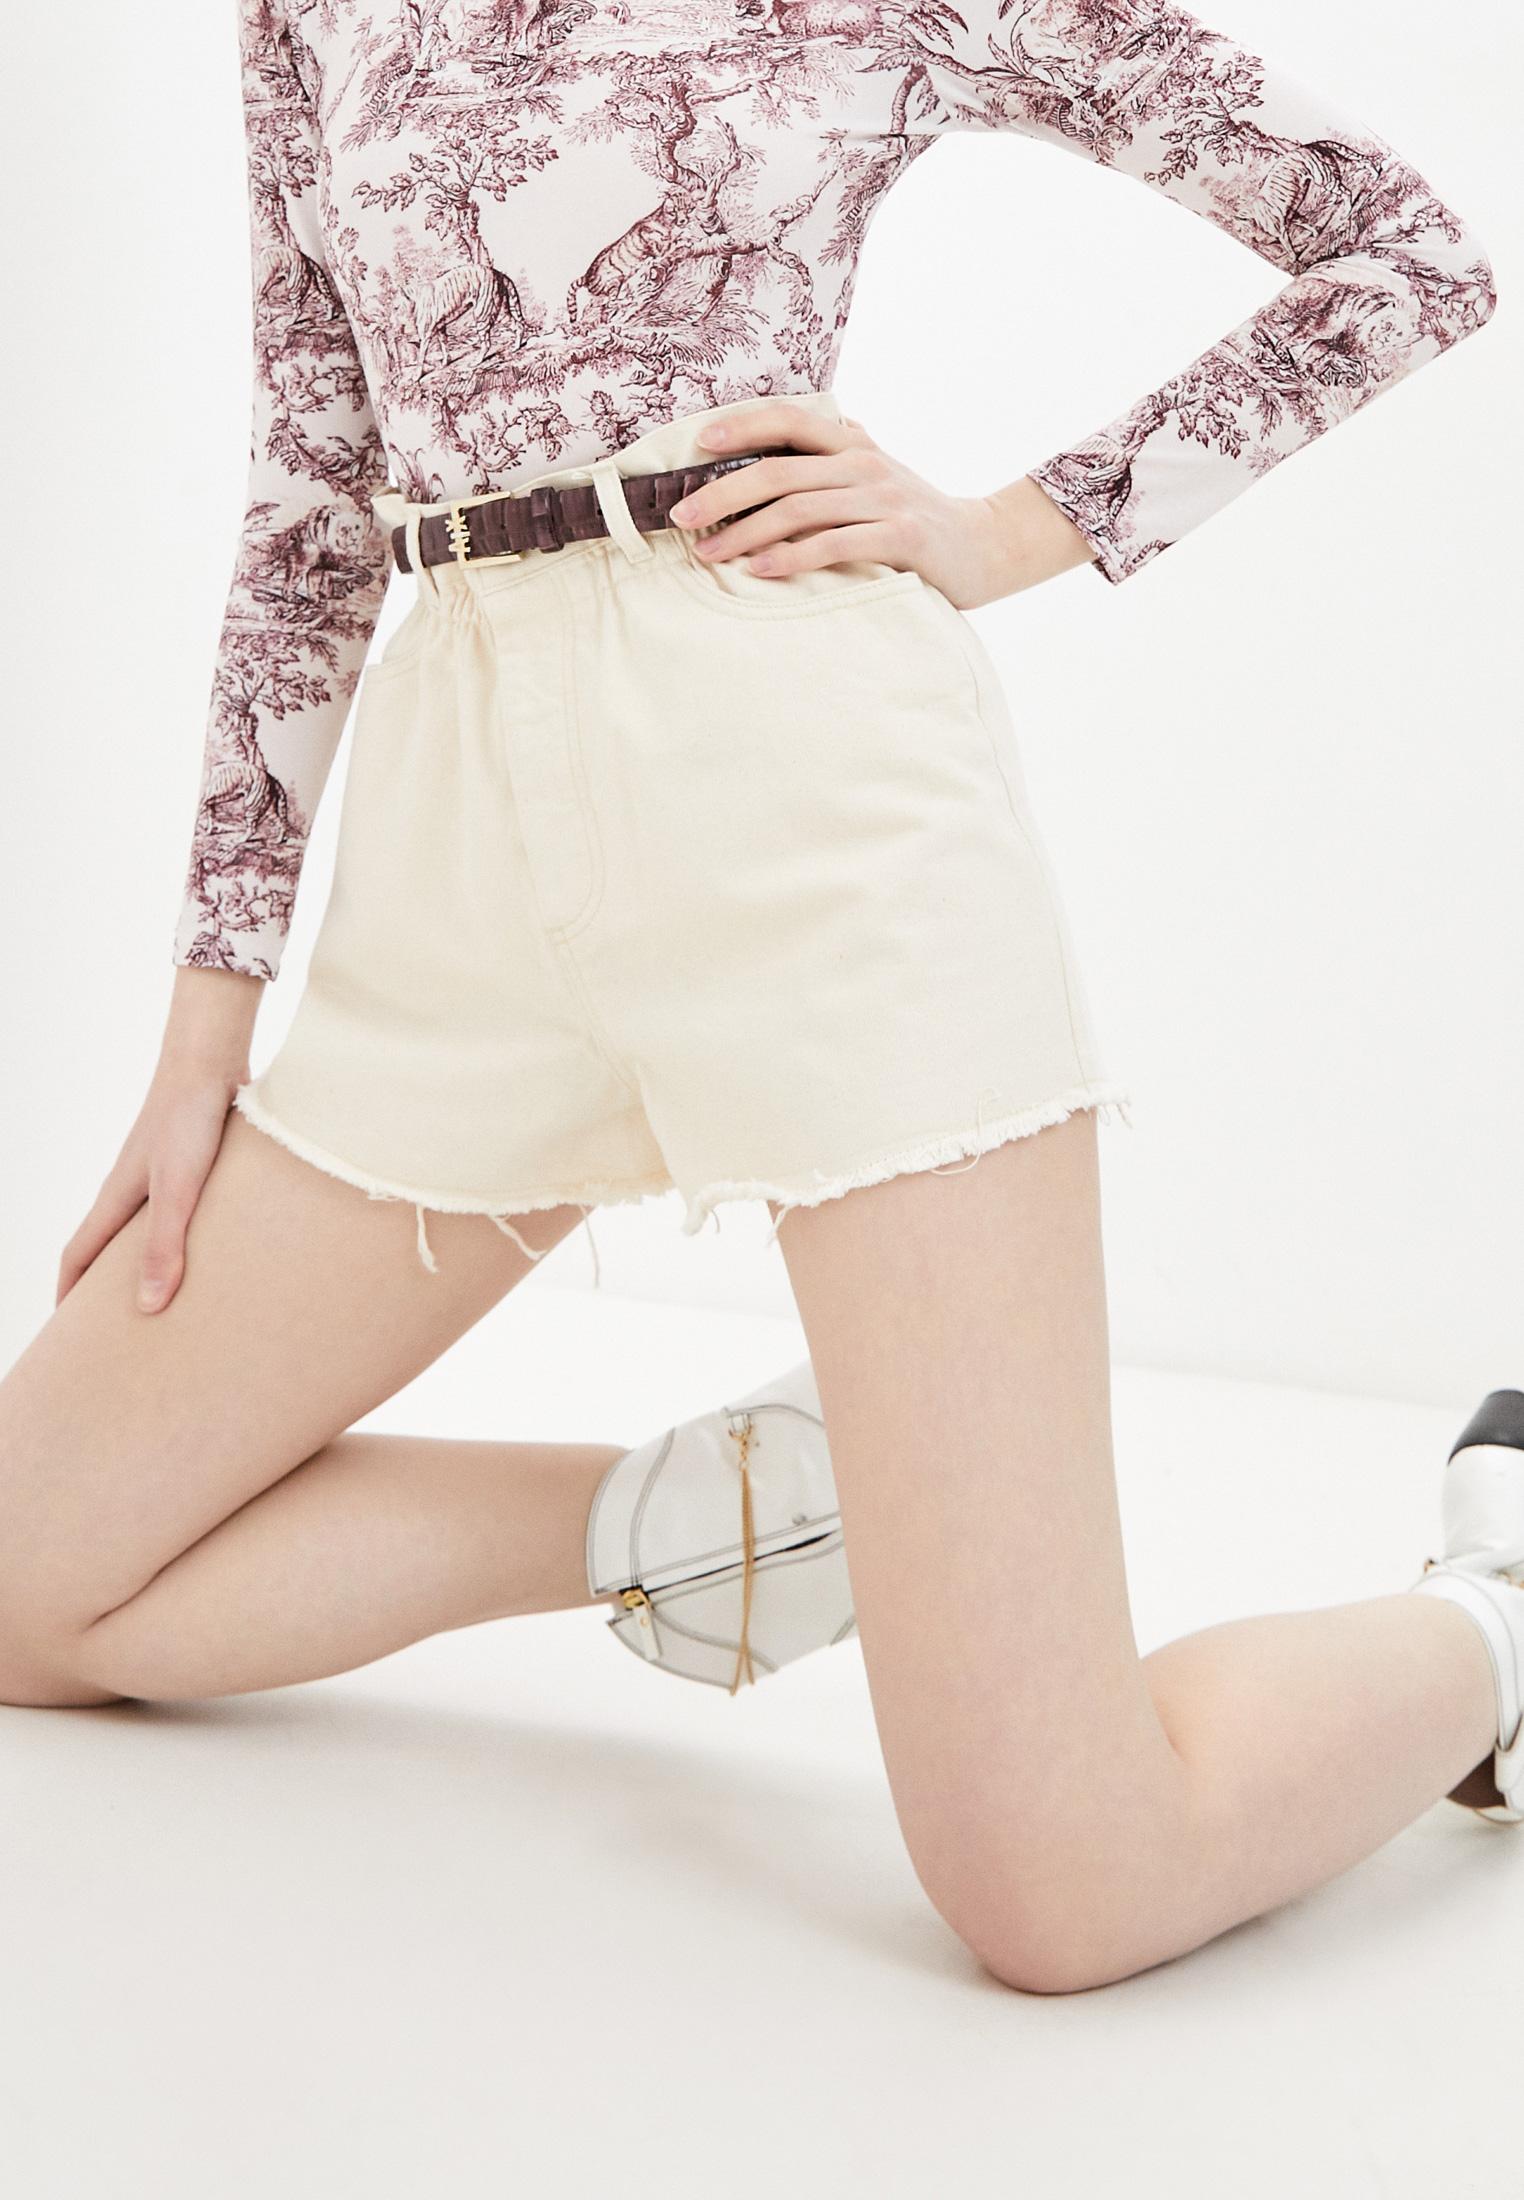 Женские джинсовые шорты Forte Dei Marmi Couture Шорты джинсовые Forte Dei Marmi Couture